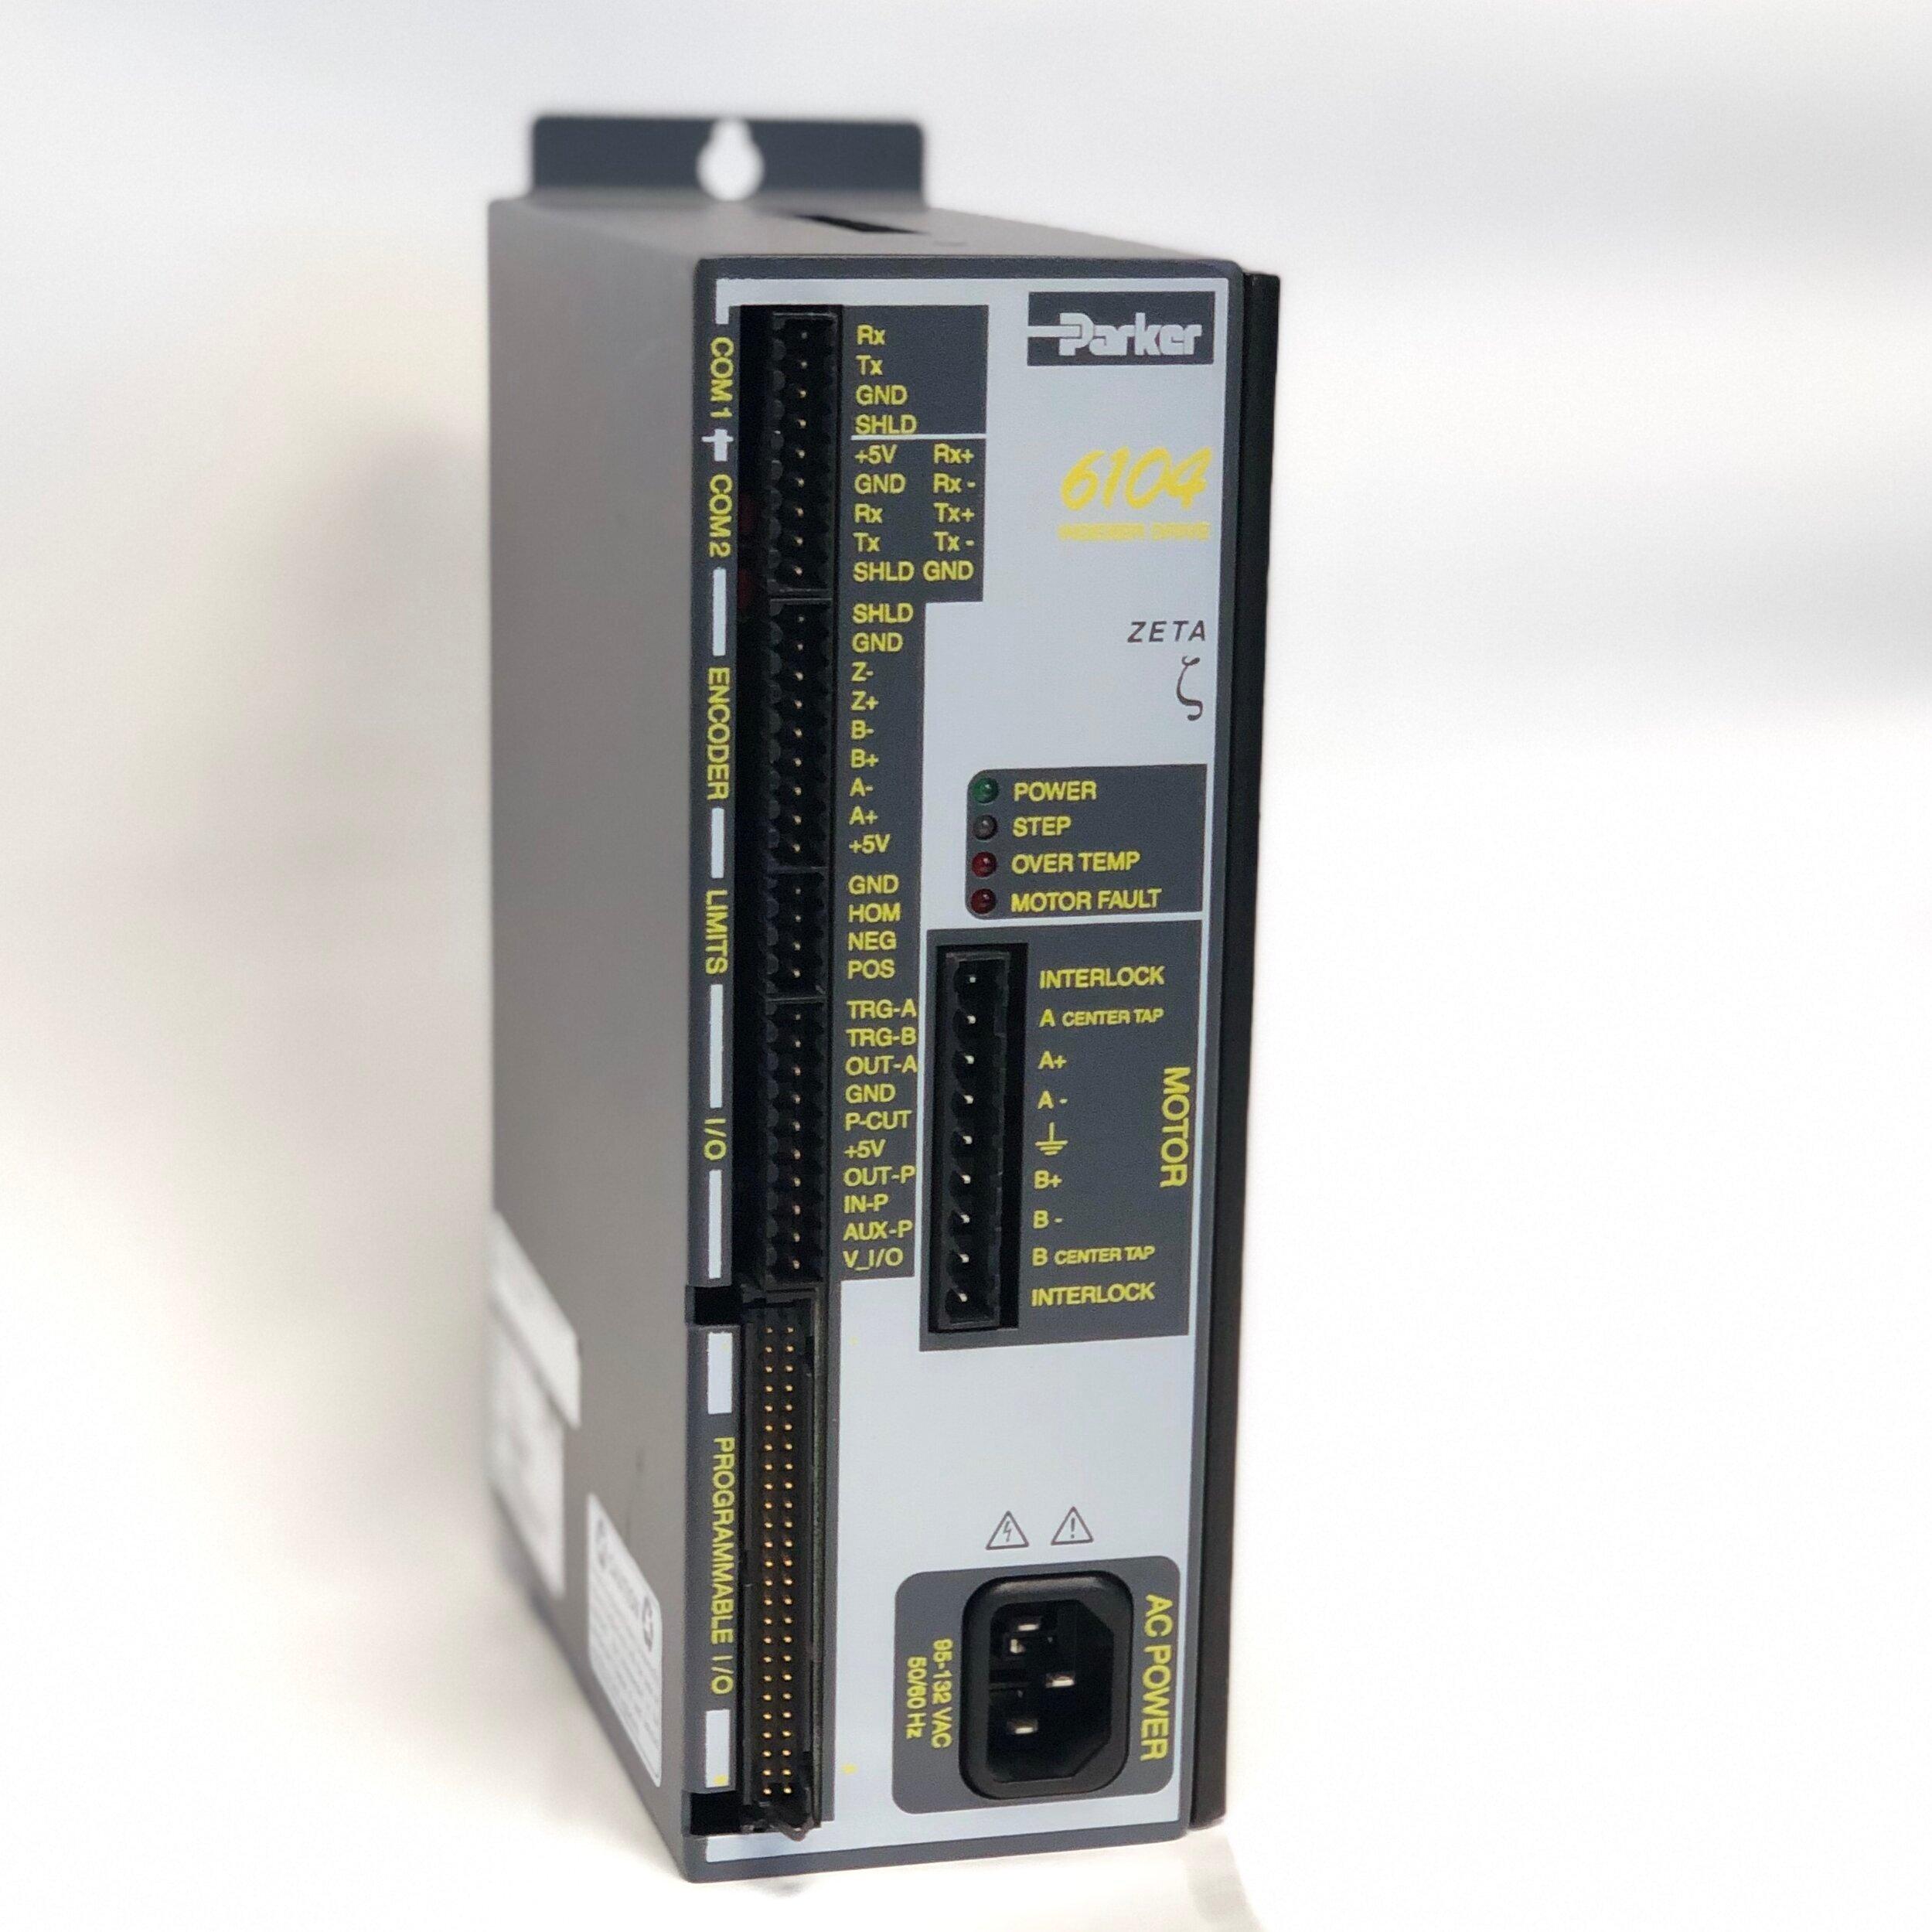 Zeta Driver Refub - • Certified Refurbishment Loop• Plug and Play replacement• Replace individual units• Upgrade in development